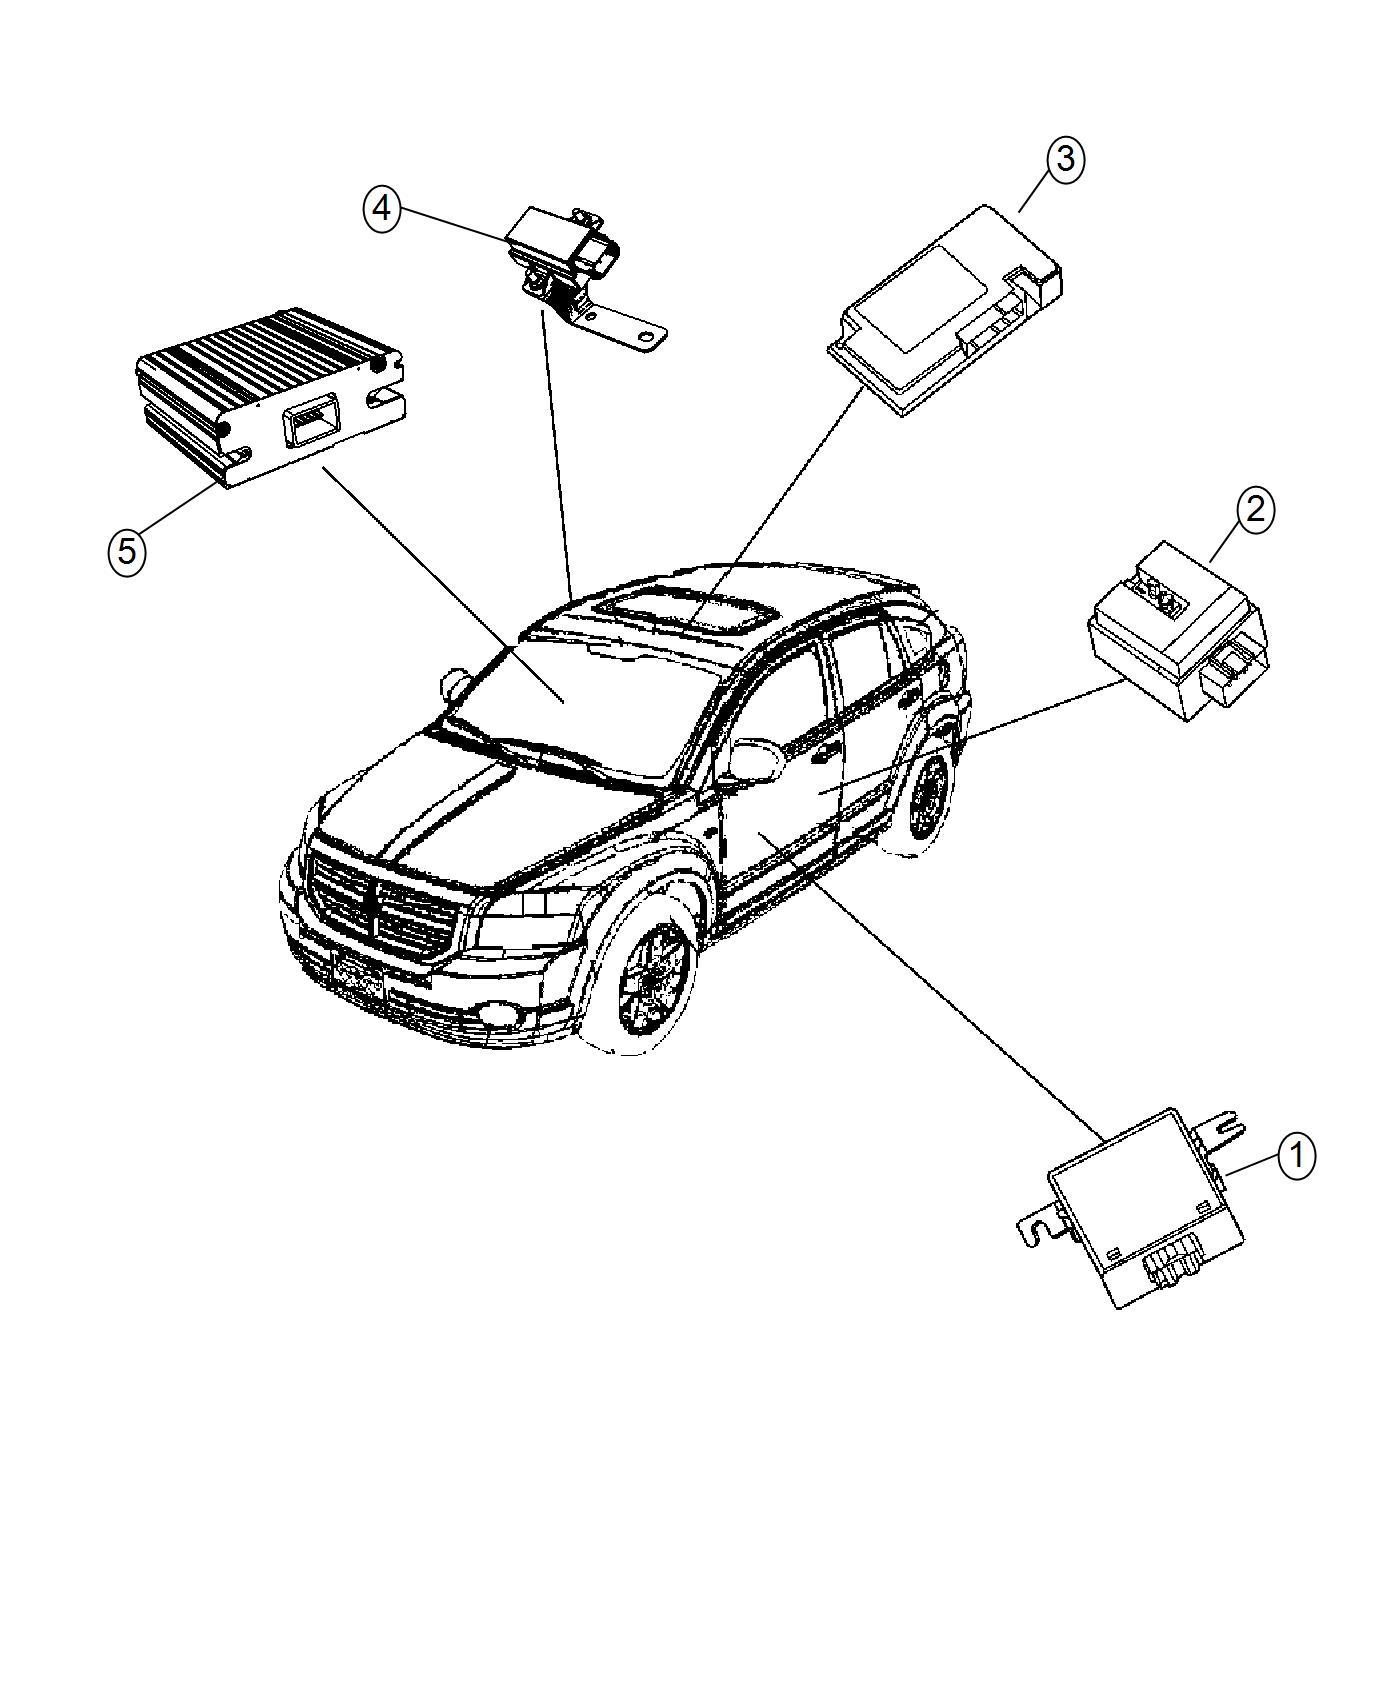 2016 Jeep Compass Module. Export. Telematics. Nav, radios